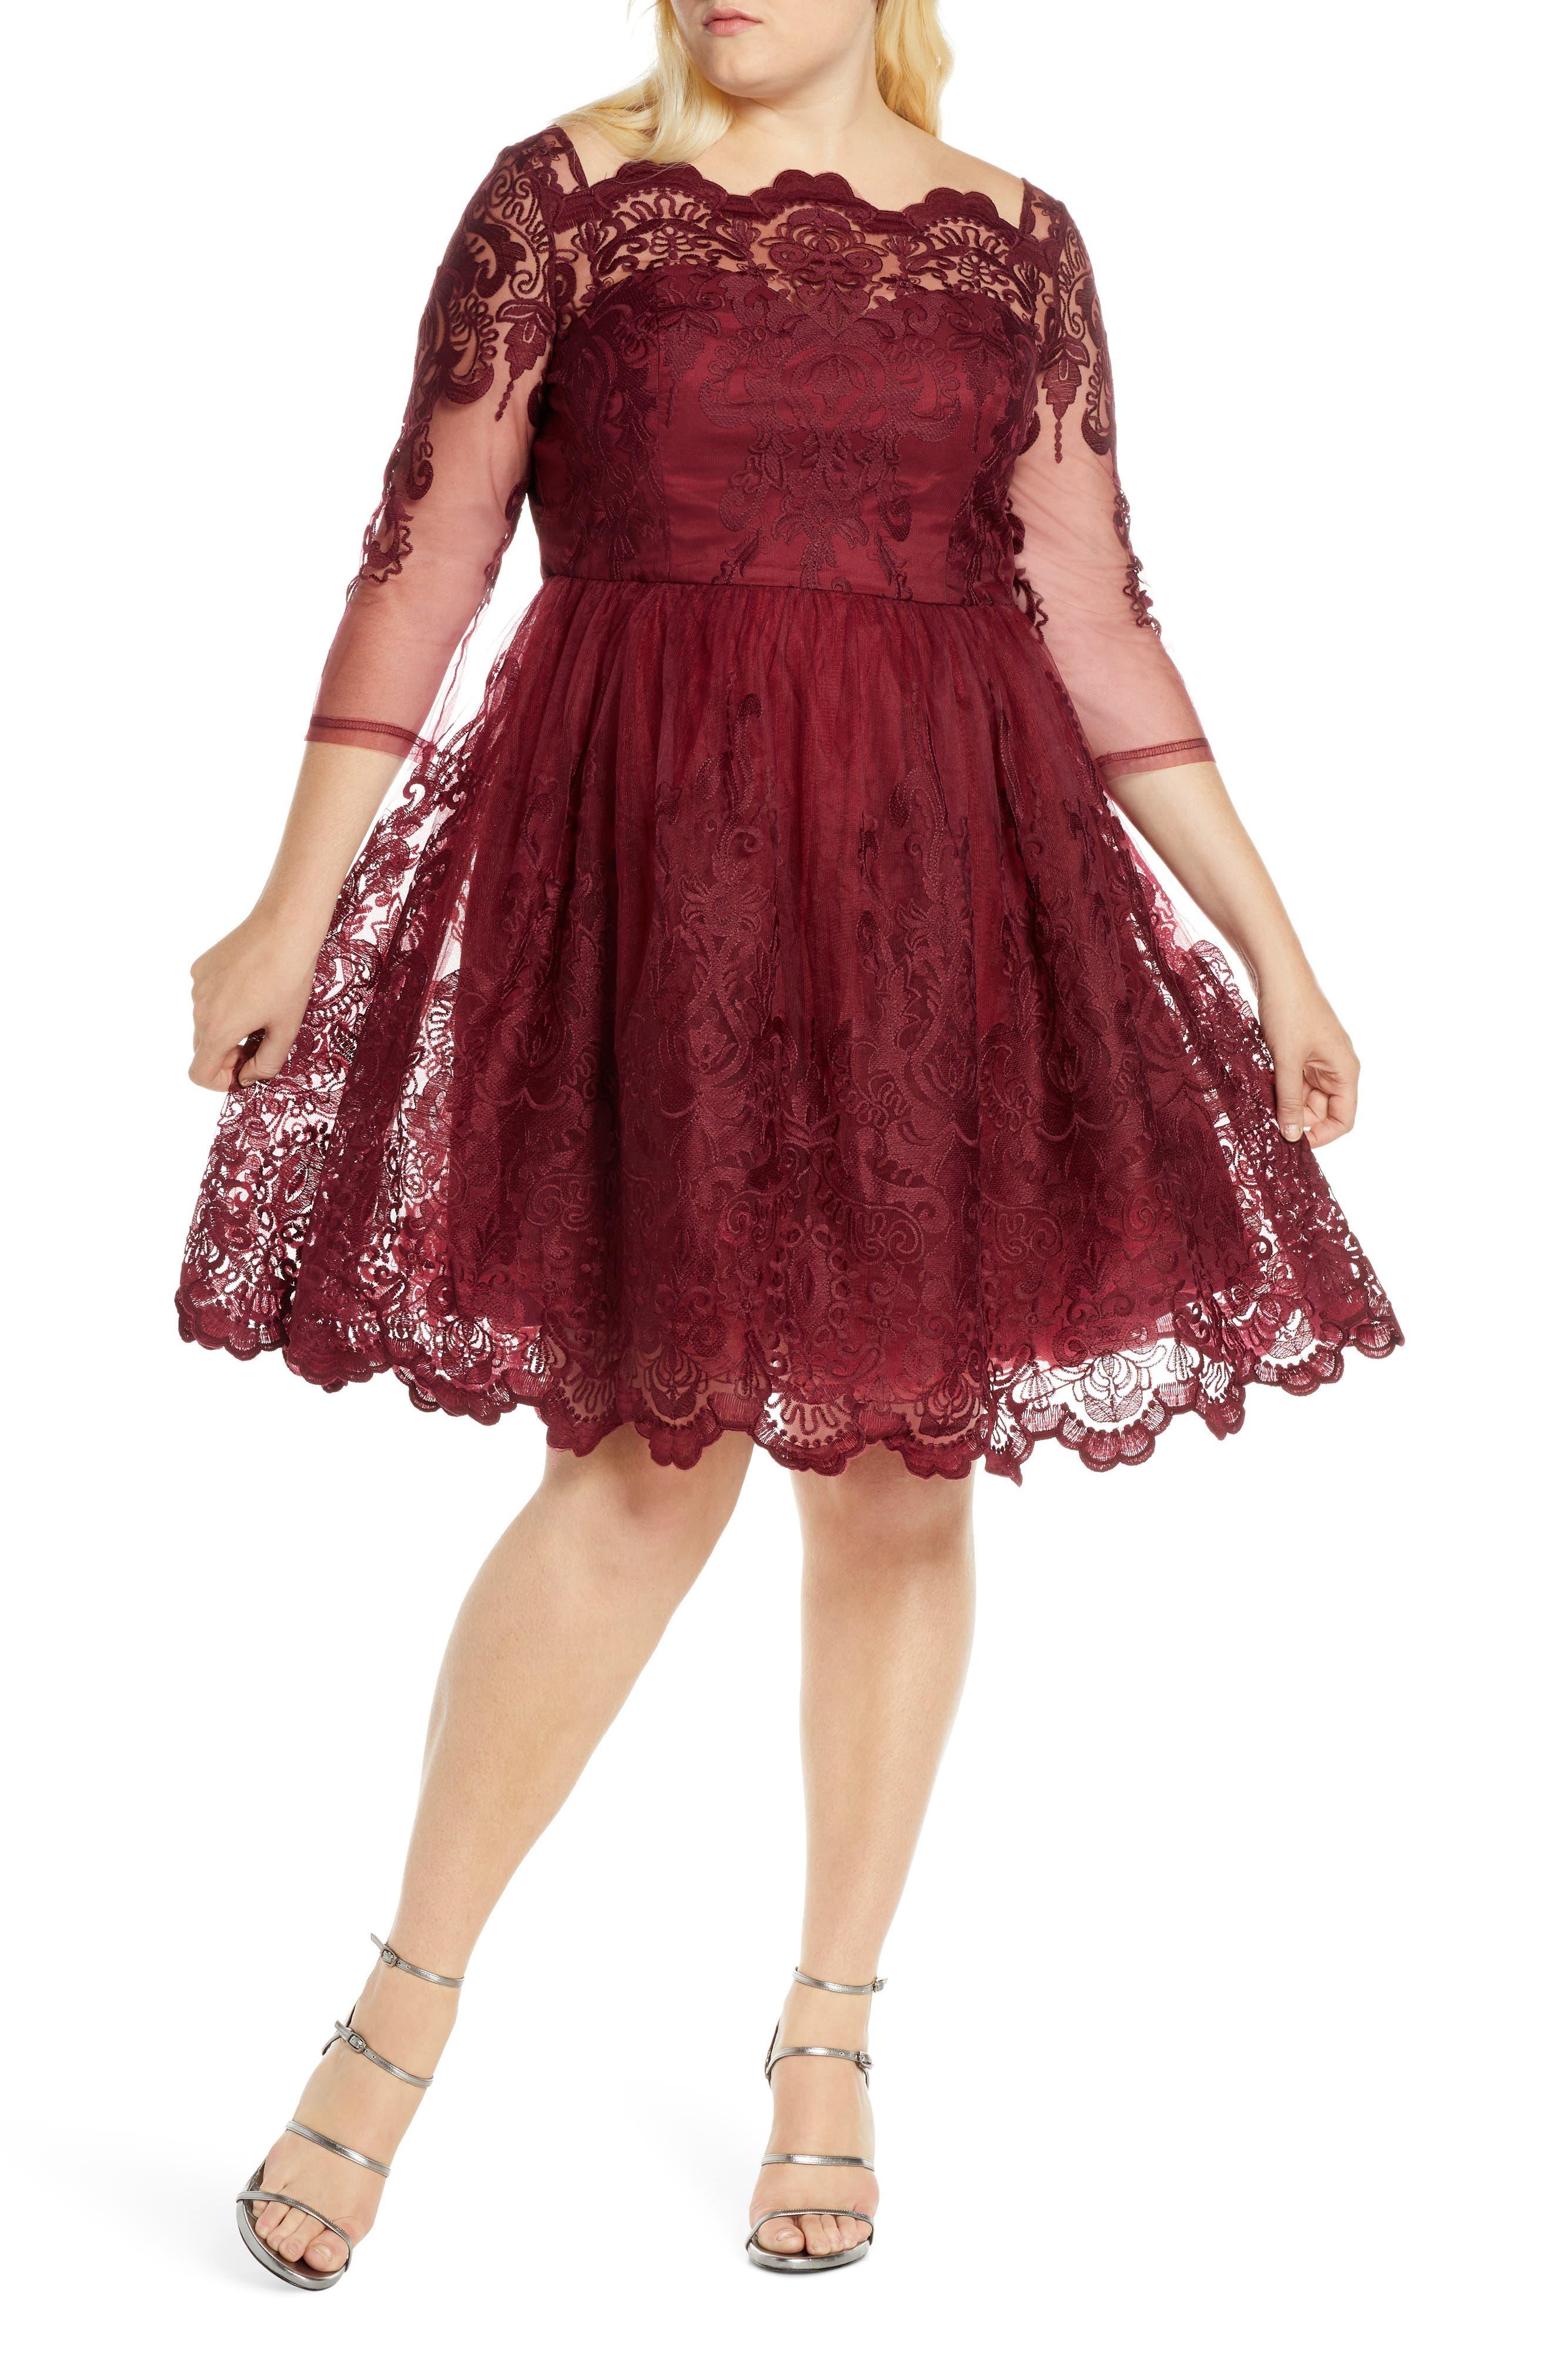 1950s Plus Size Dresses, Swing Dresses Plus Size Womens Chi Chi London Rosalita Lace Fit  Flare Dress $140.00 AT vintagedancer.com